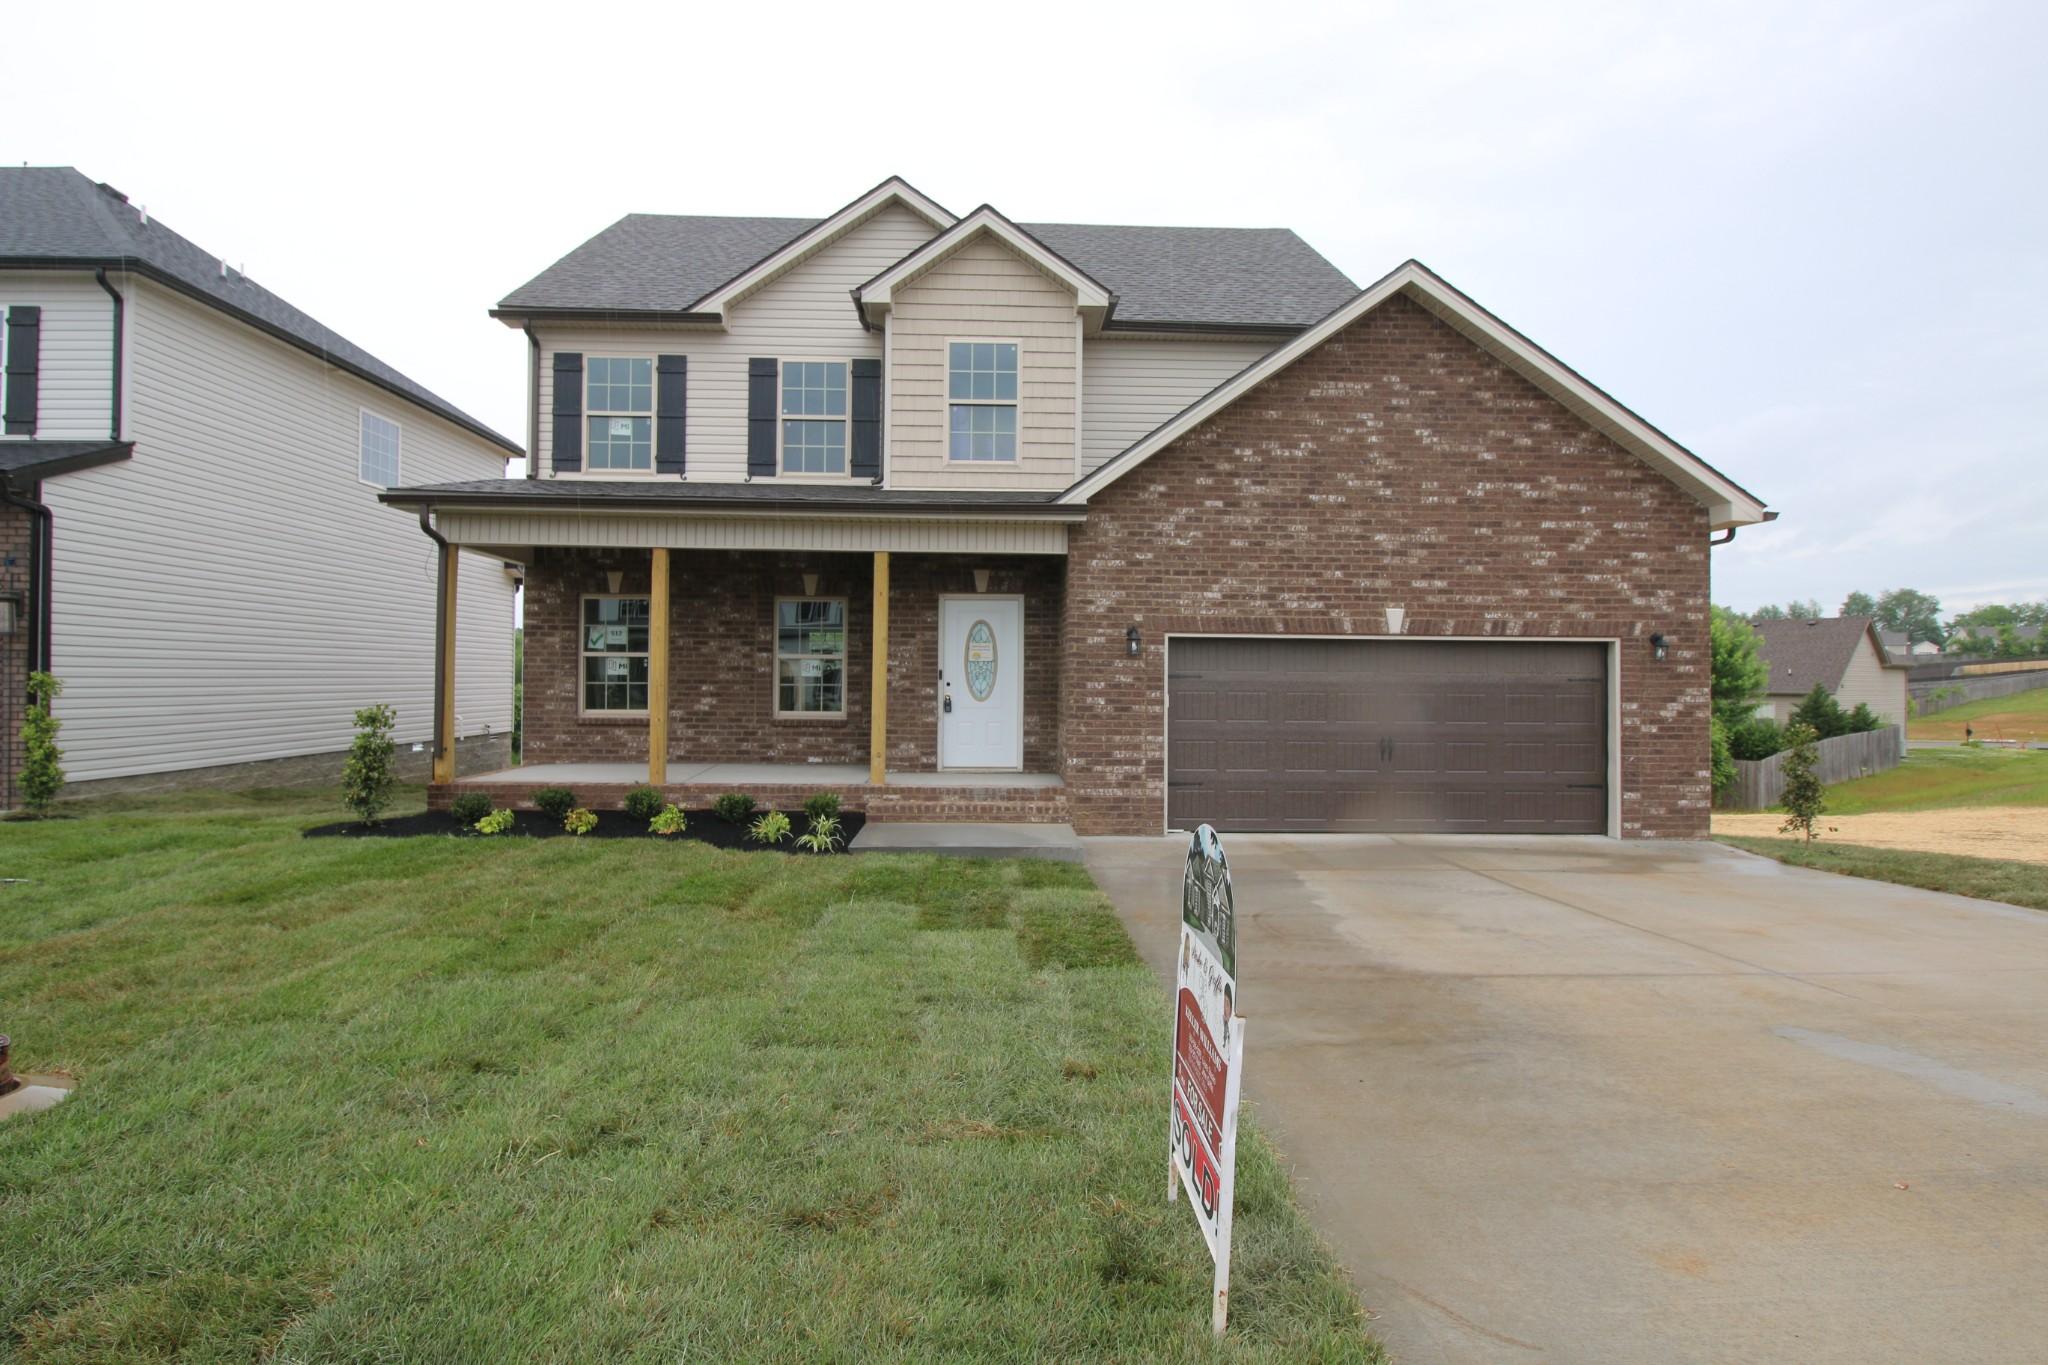 512 Autumn Creek Property Photo - Clarksville, TN real estate listing